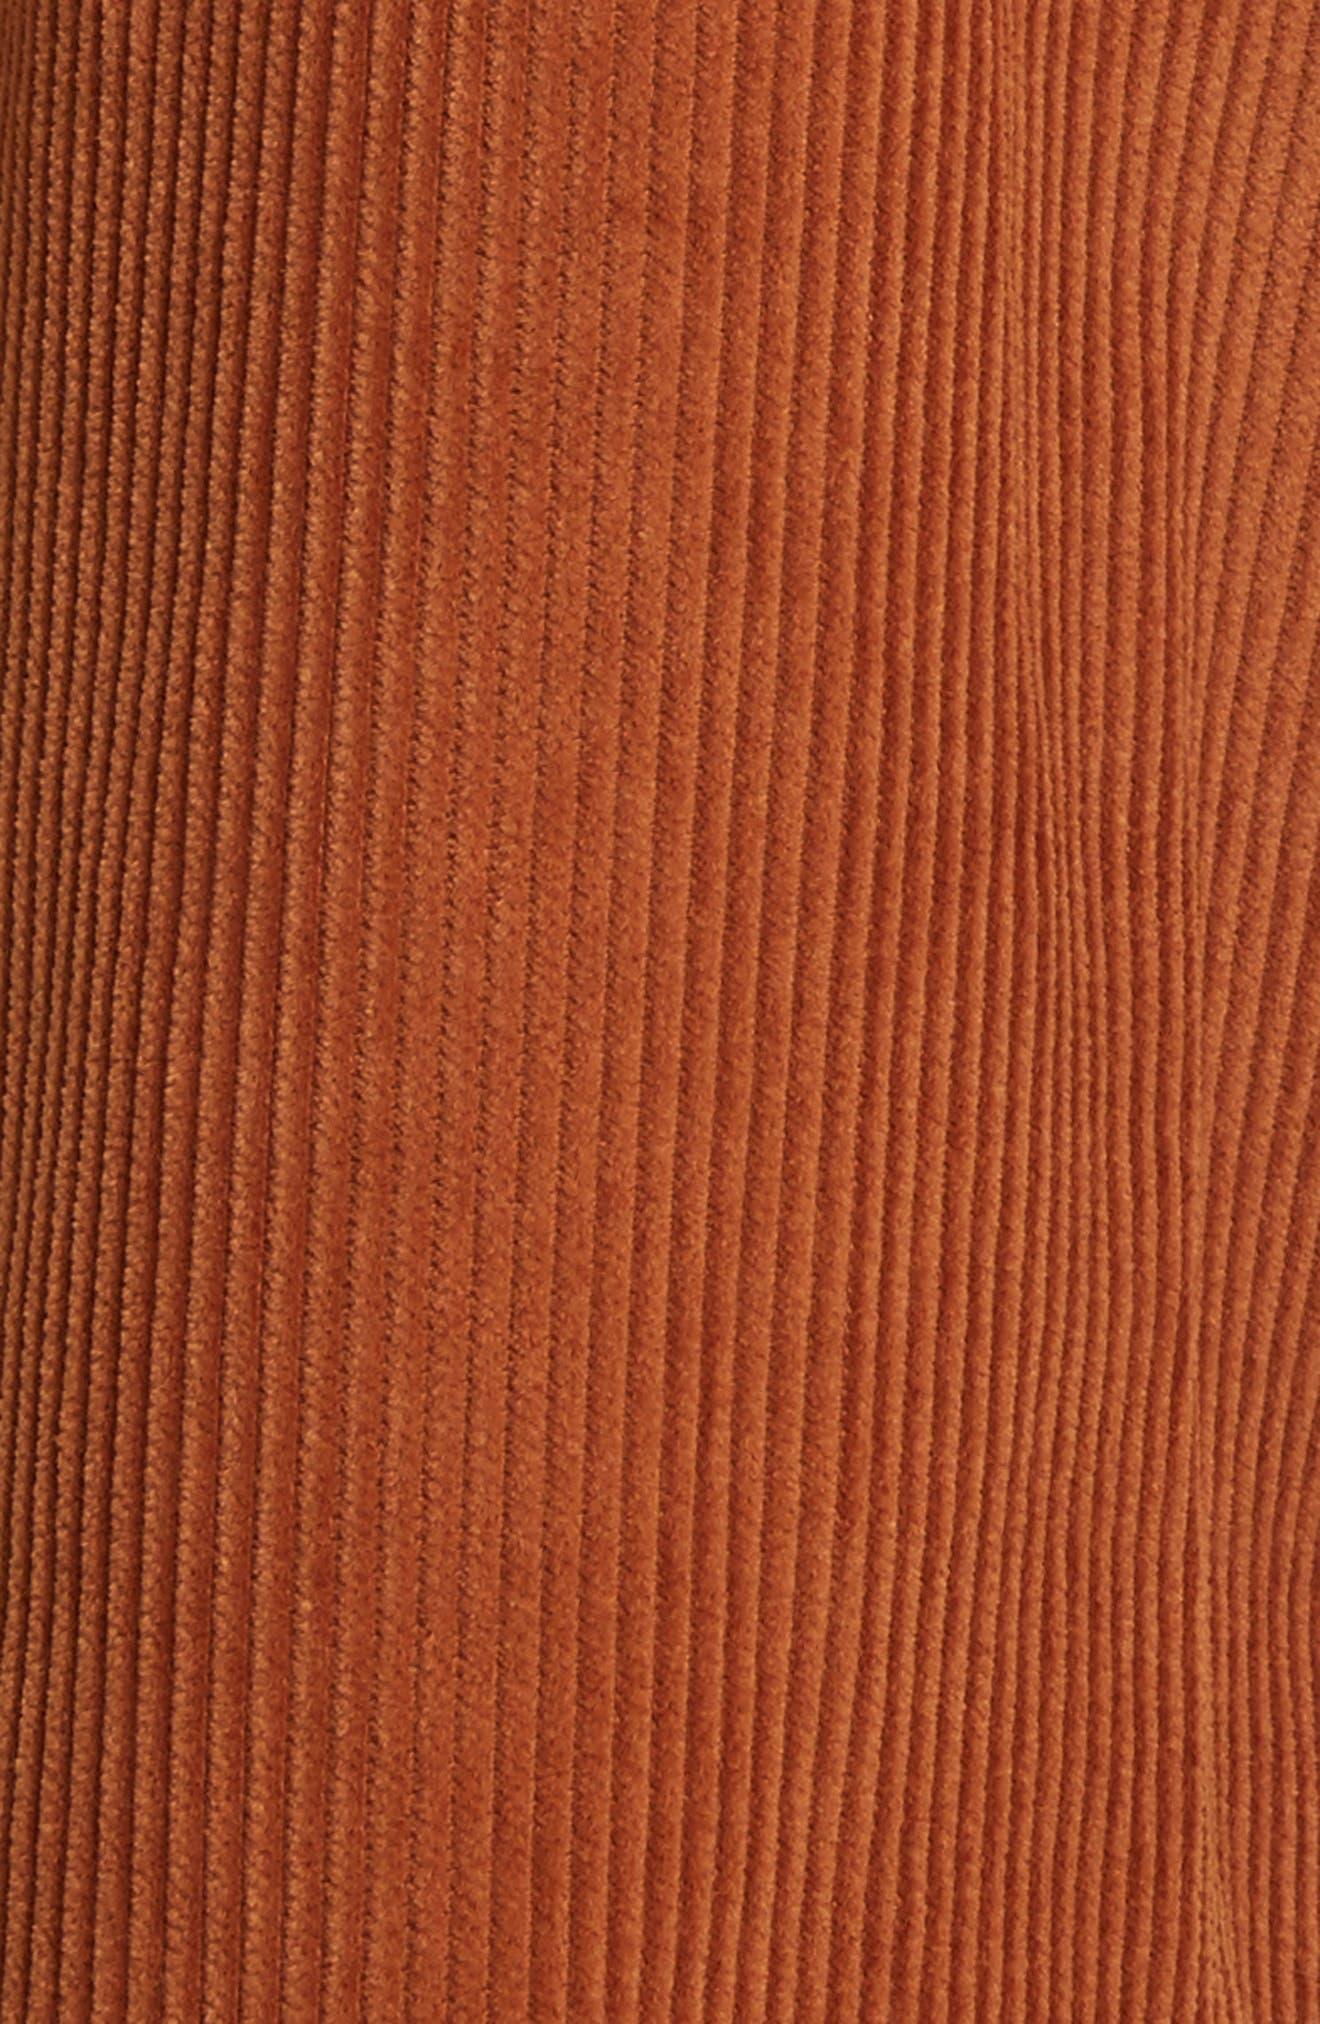 Crop Flare Corduroy Trousers,                             Alternate thumbnail 5, color,                             200